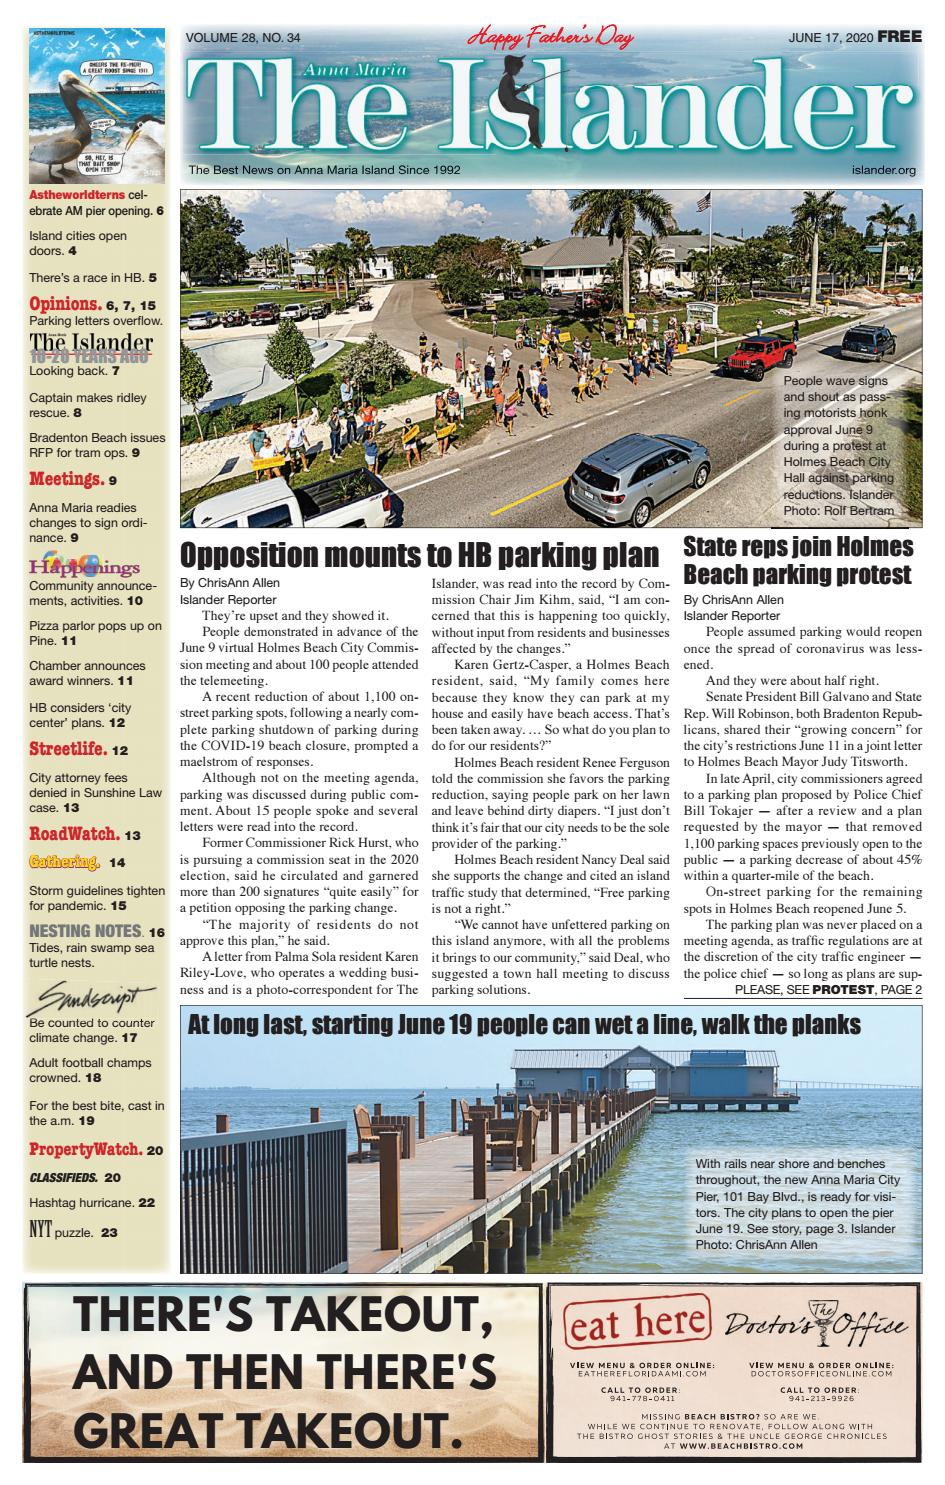 Cornerstone Church Spooner Wi Christmas Walk 2020 The Islander Newspaper E Edition Wednesday, June. 17, 2020 by The